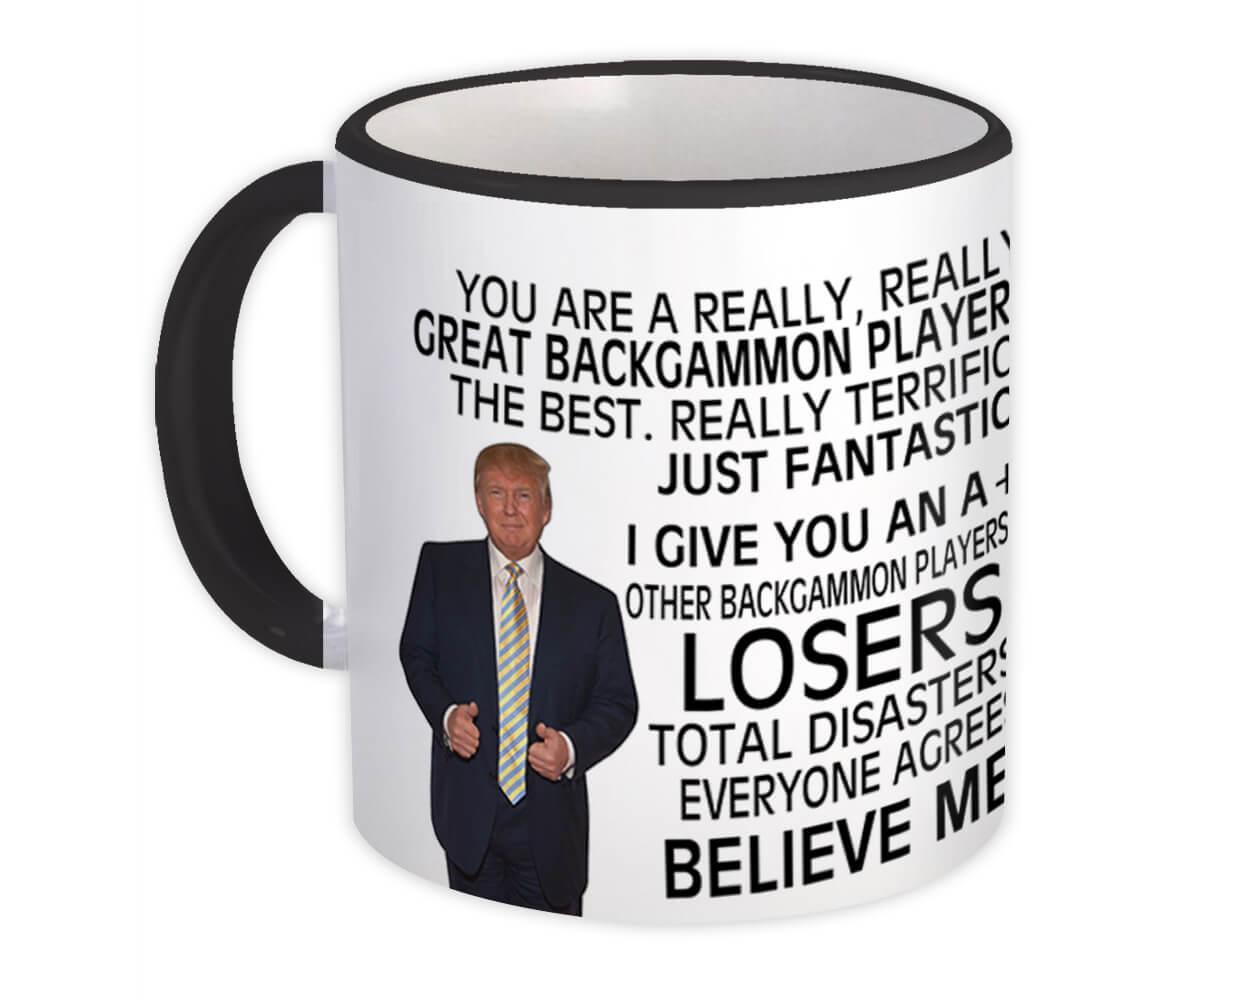 Gift for Backgammon Player : Gift Mug Donald Trump Great Backgammon Player Funny Christmas